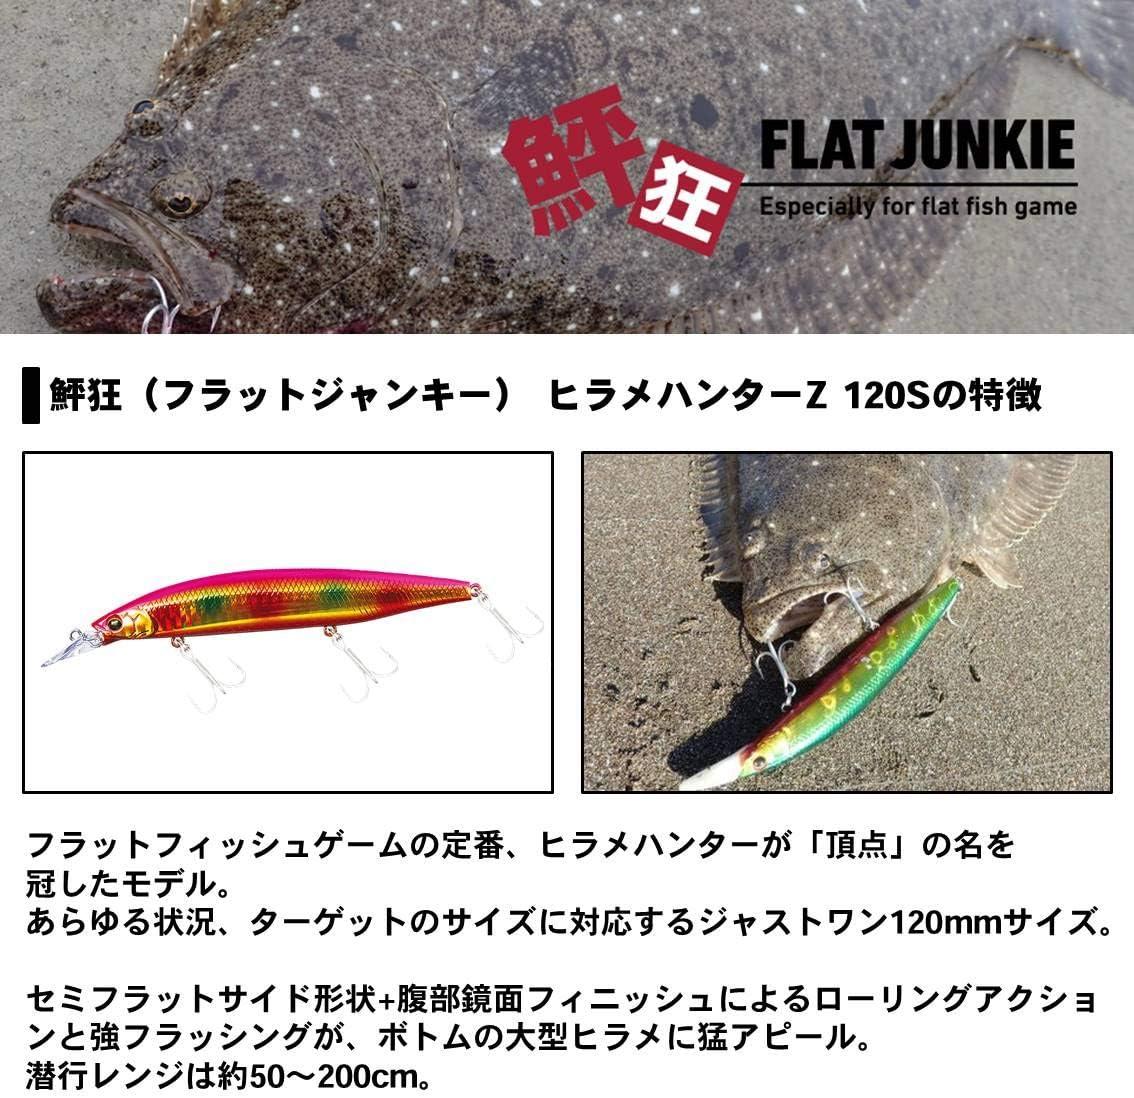 DAIWA FLAT JUNKIE HIRAME HUNTER Z 120S flounder lure 120 S sinking minnow